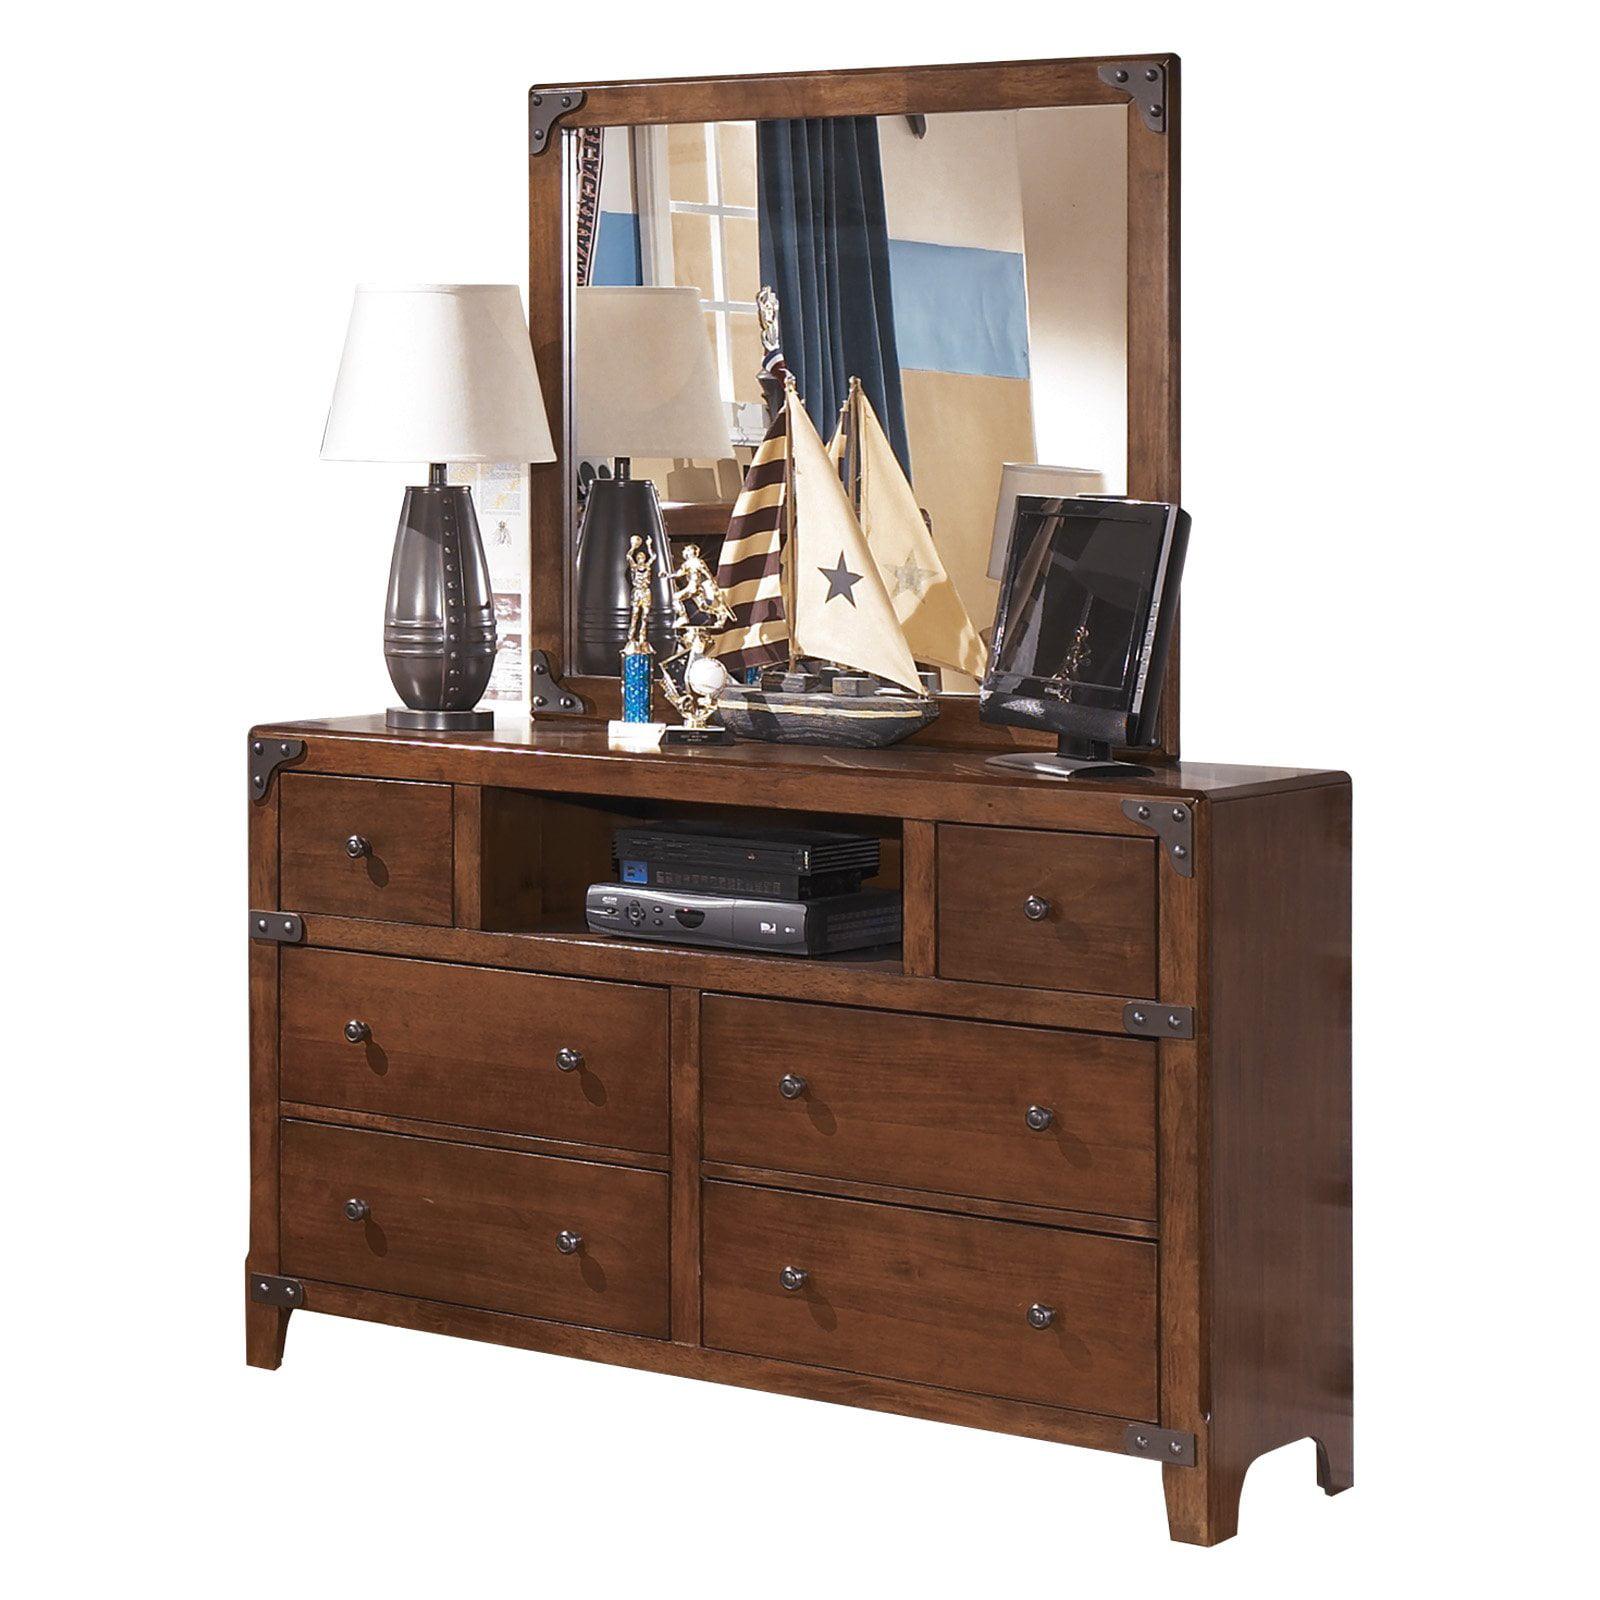 Signature Design by Ashley Delburne 6 Drawer Dresser with Mirror